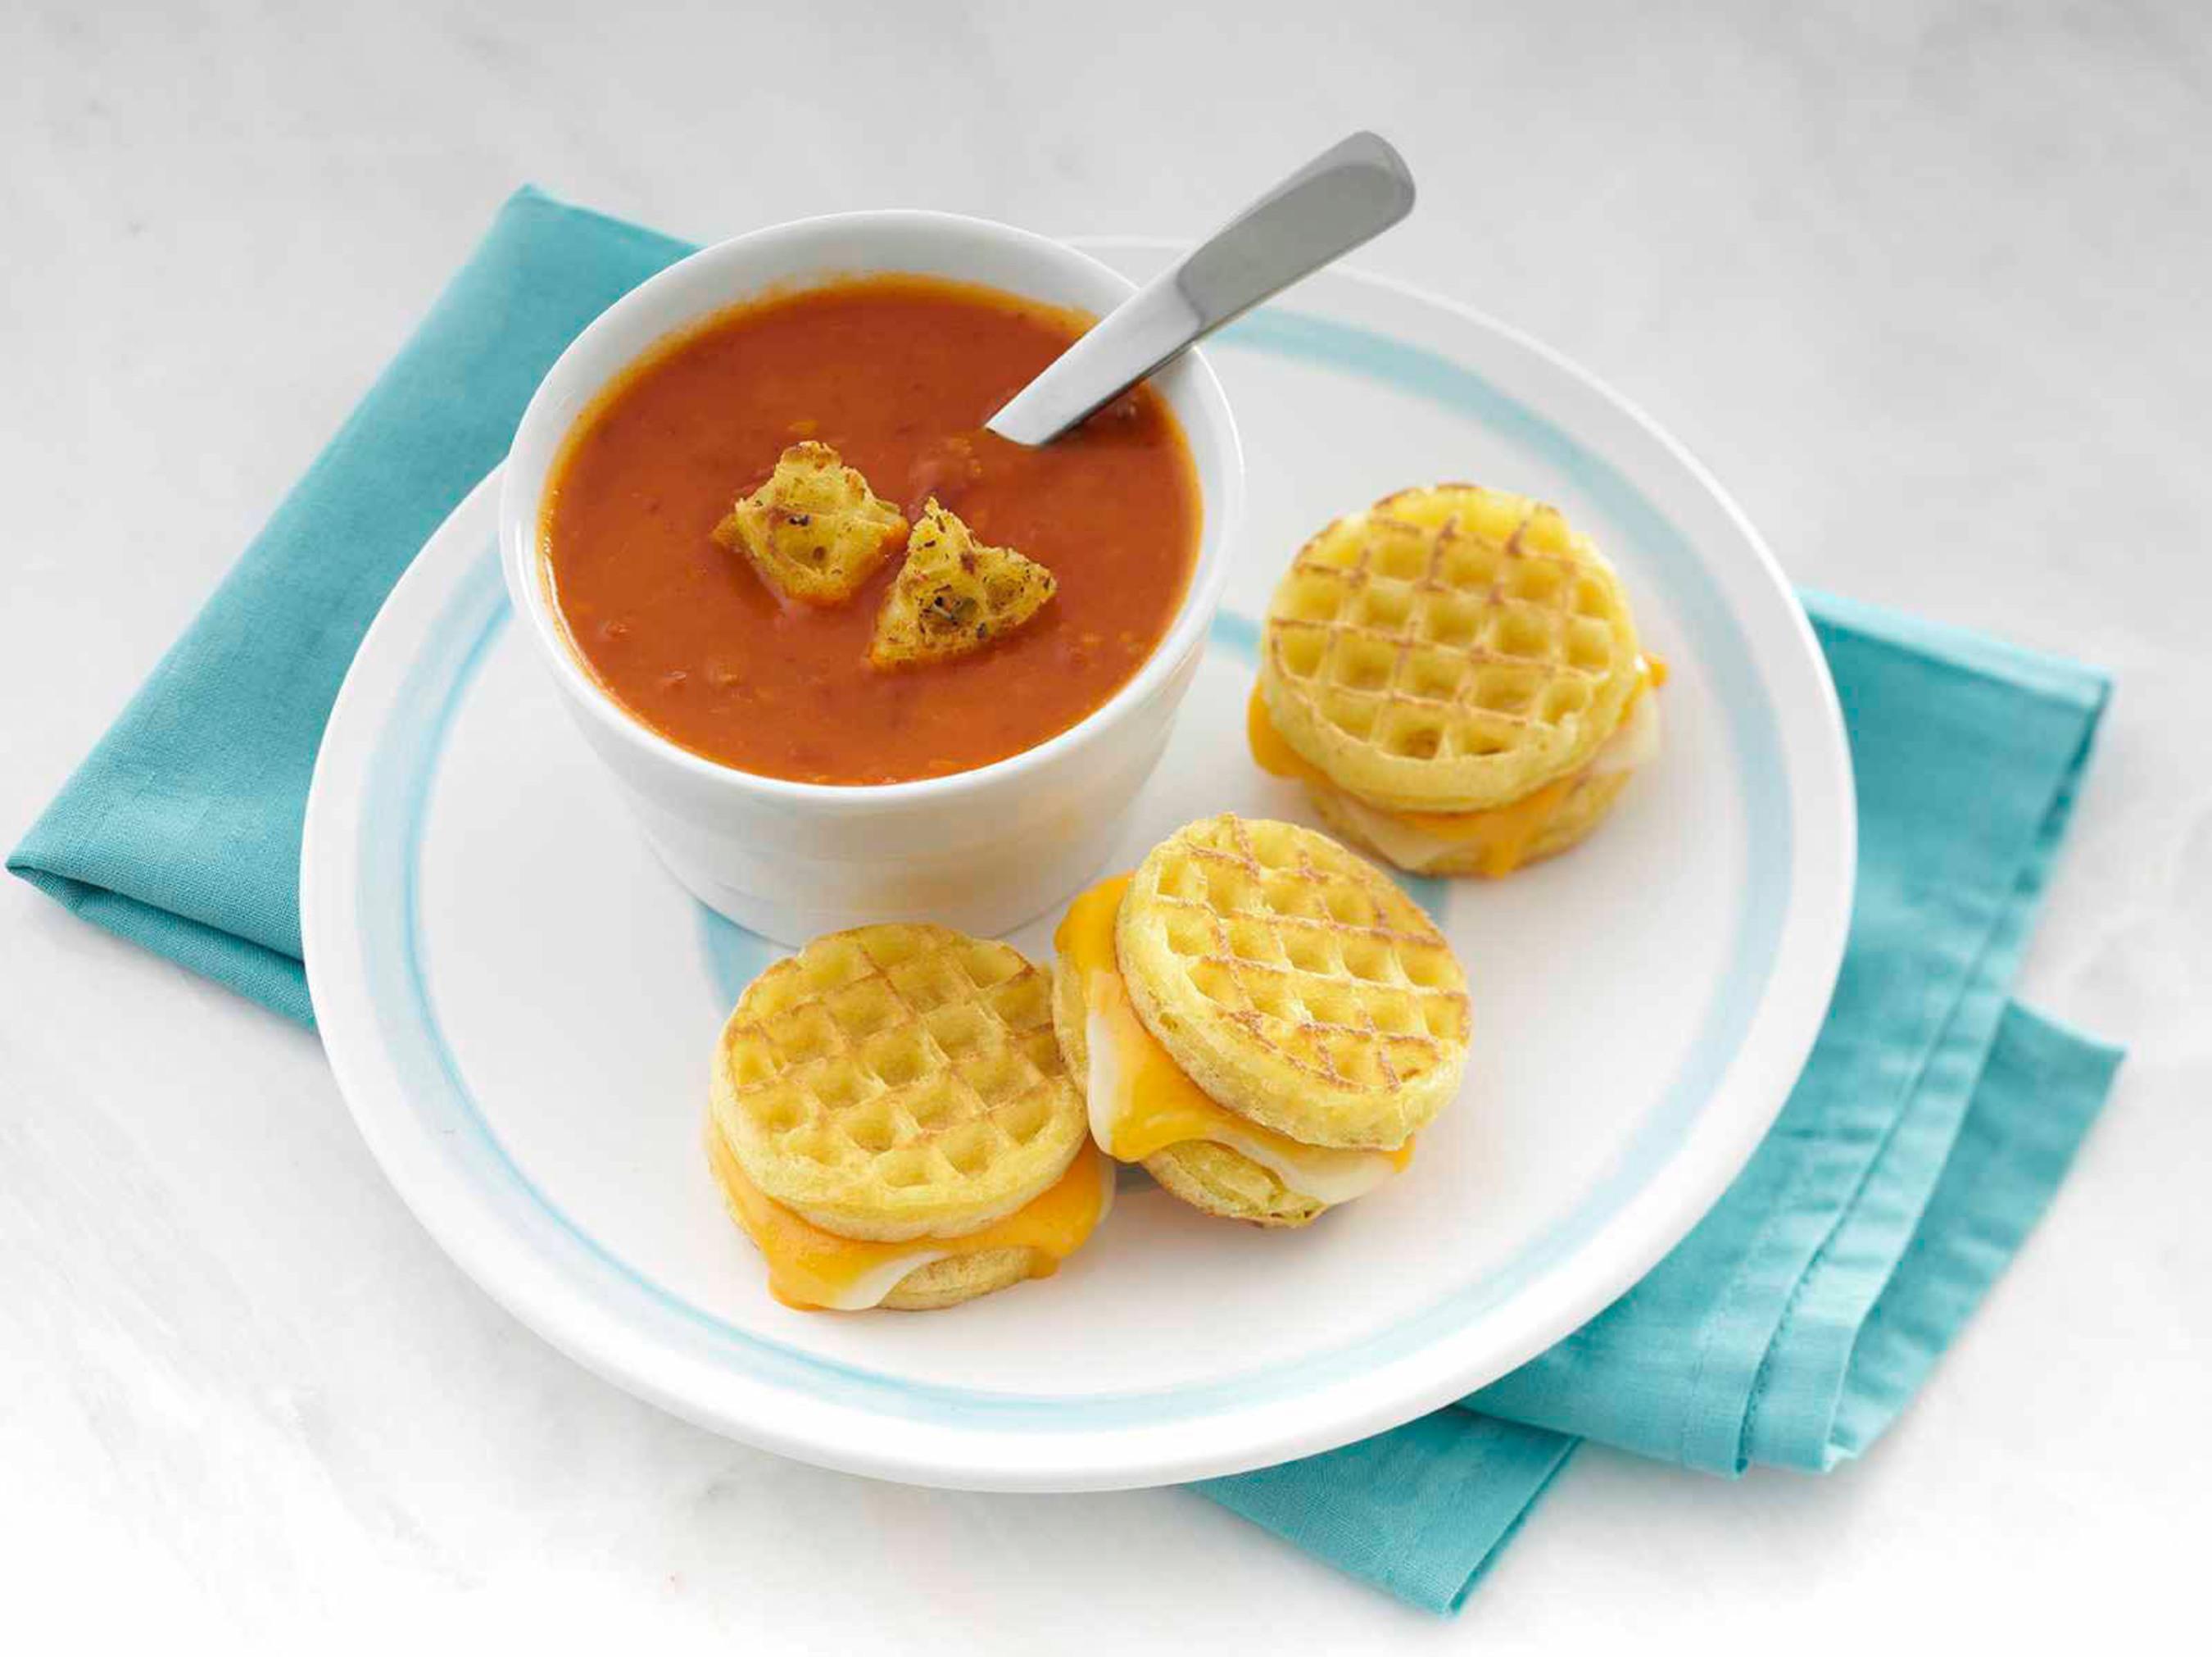 Eggo(R) Grilled Cheese Sandwiches.  (PRNewsFoto/Kellogg Company)